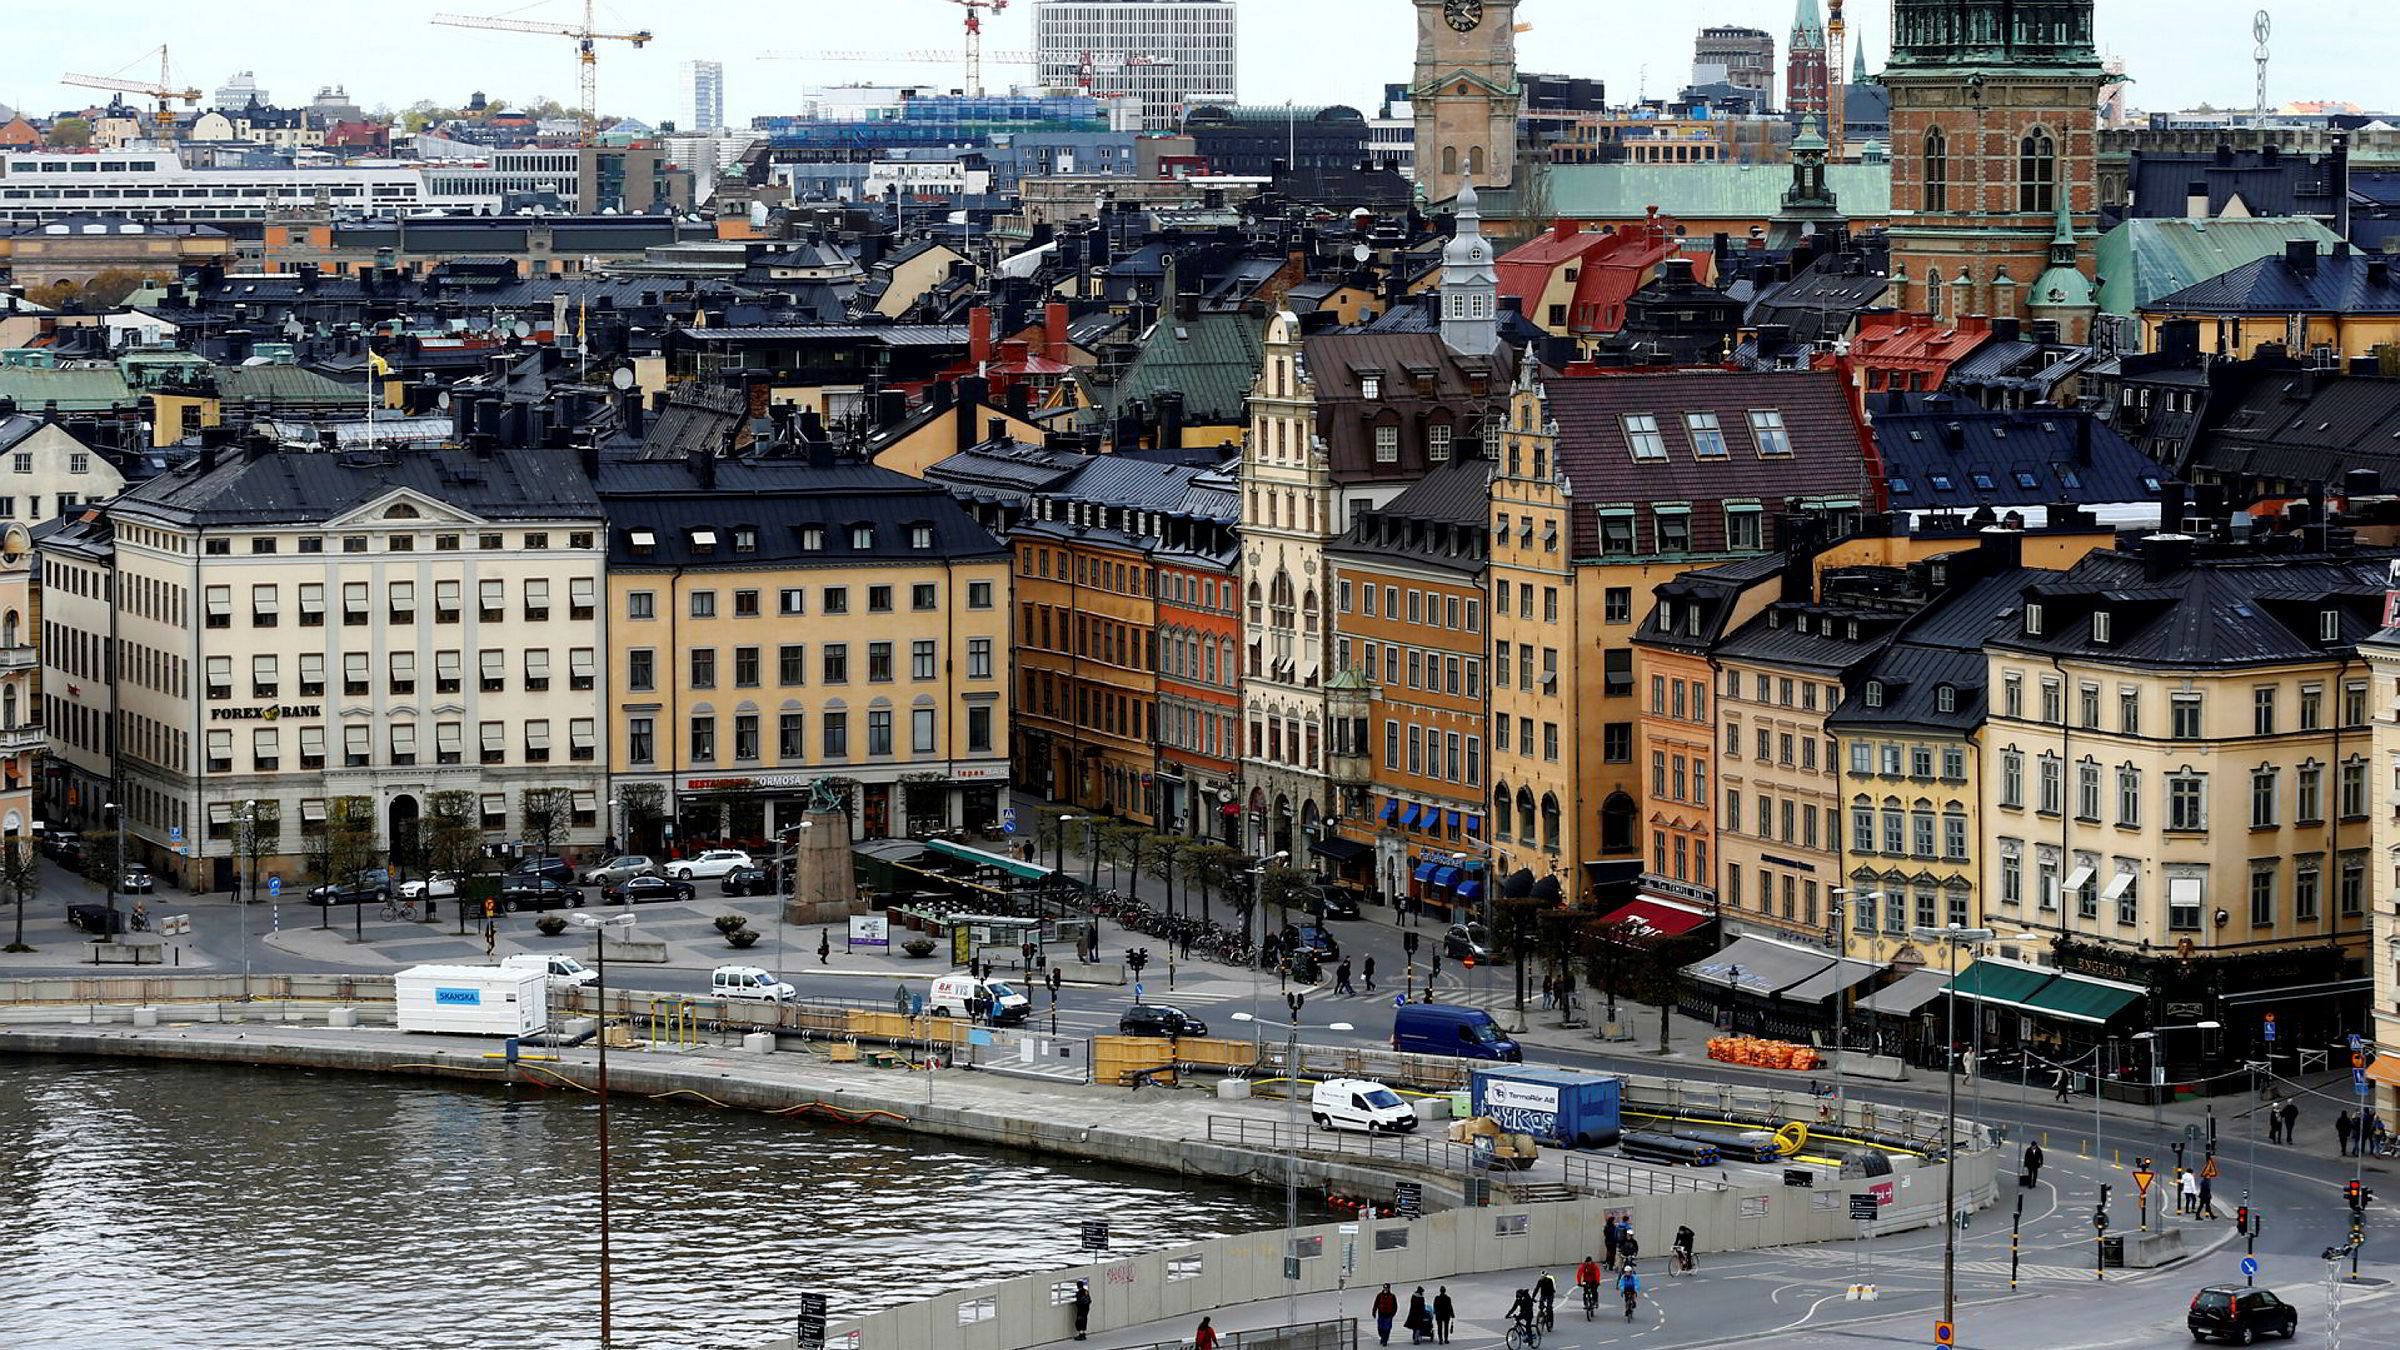 Analytiker hos det svenske Boverket venter prisras på boligmarkerdet i Sverige - særlig i Stockholm.